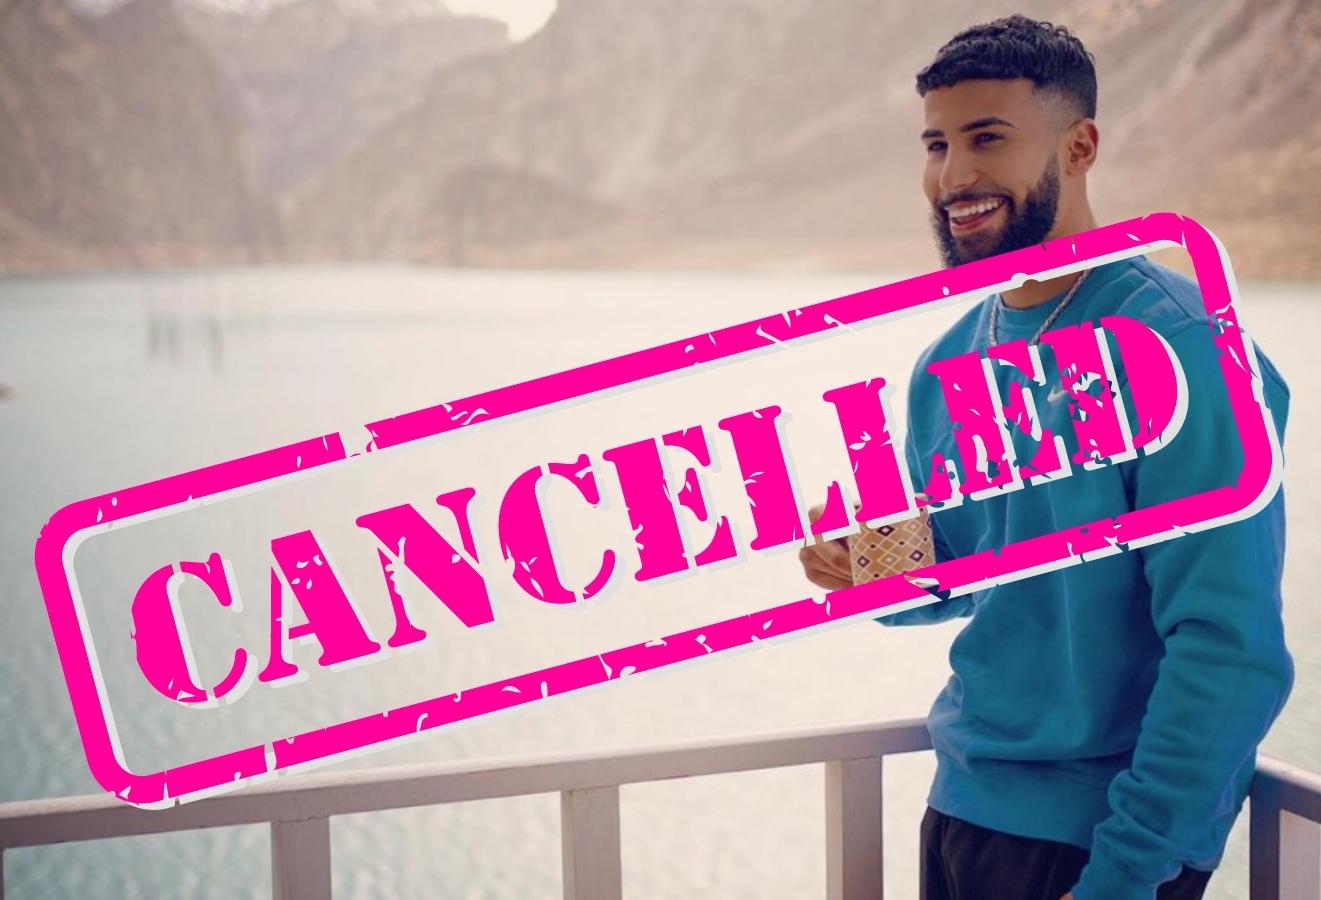 Cancel Adam Saleh Over Rape Allegations, Not Consensual Sex thumbnail